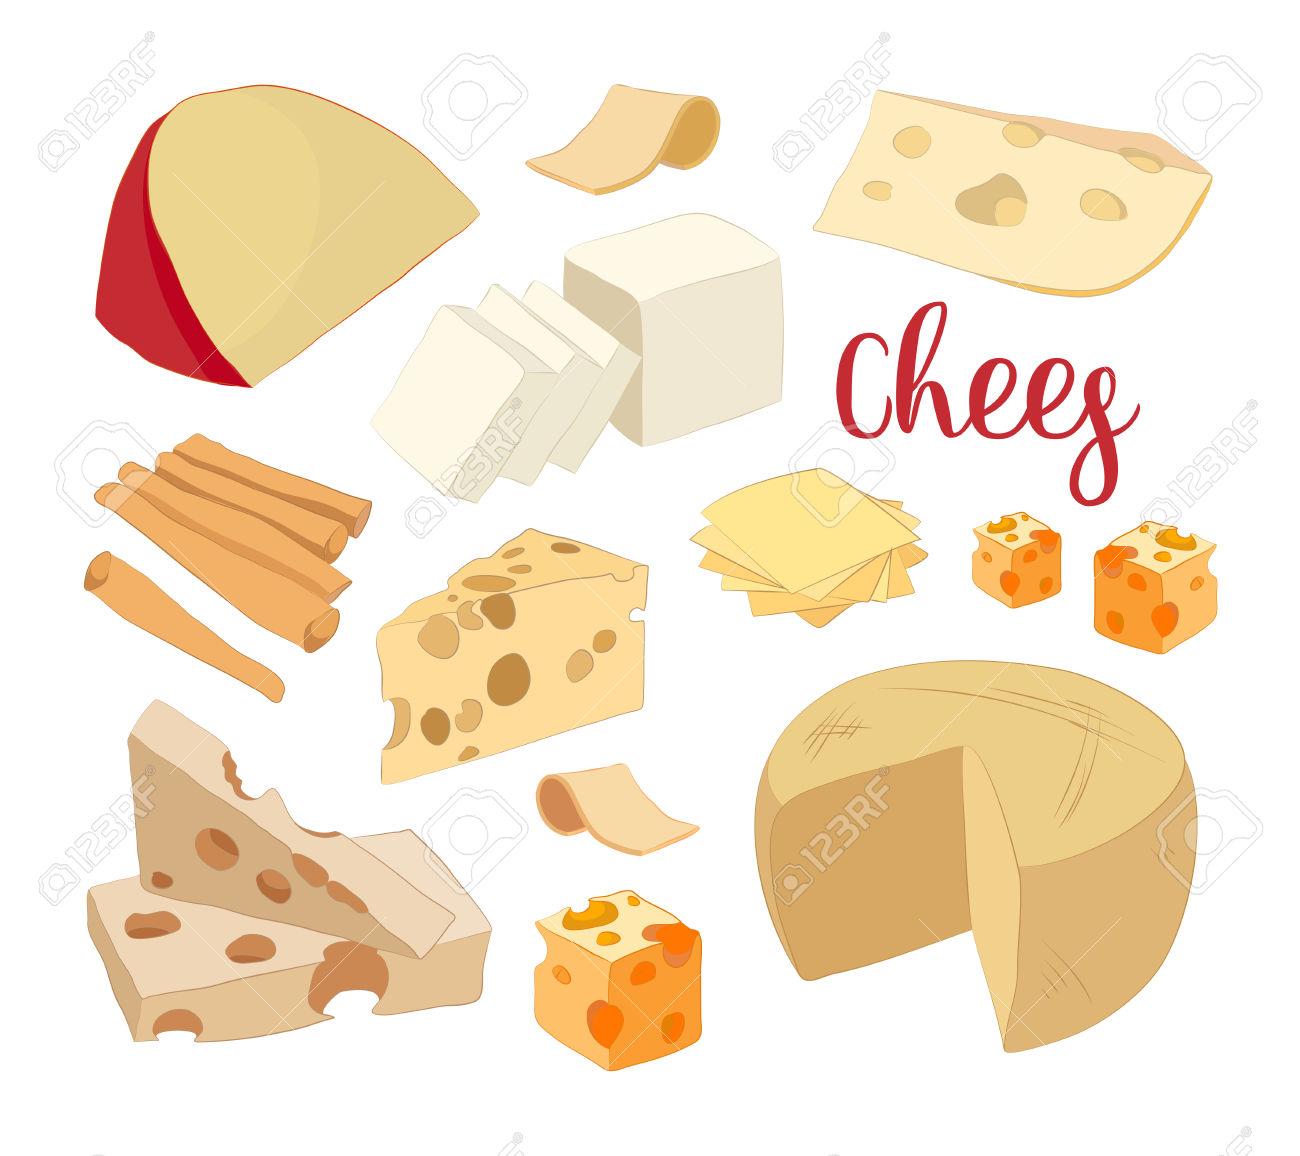 Hand Drawn Set Of Chees. Food Illustration Of Parmesan, Gouda.